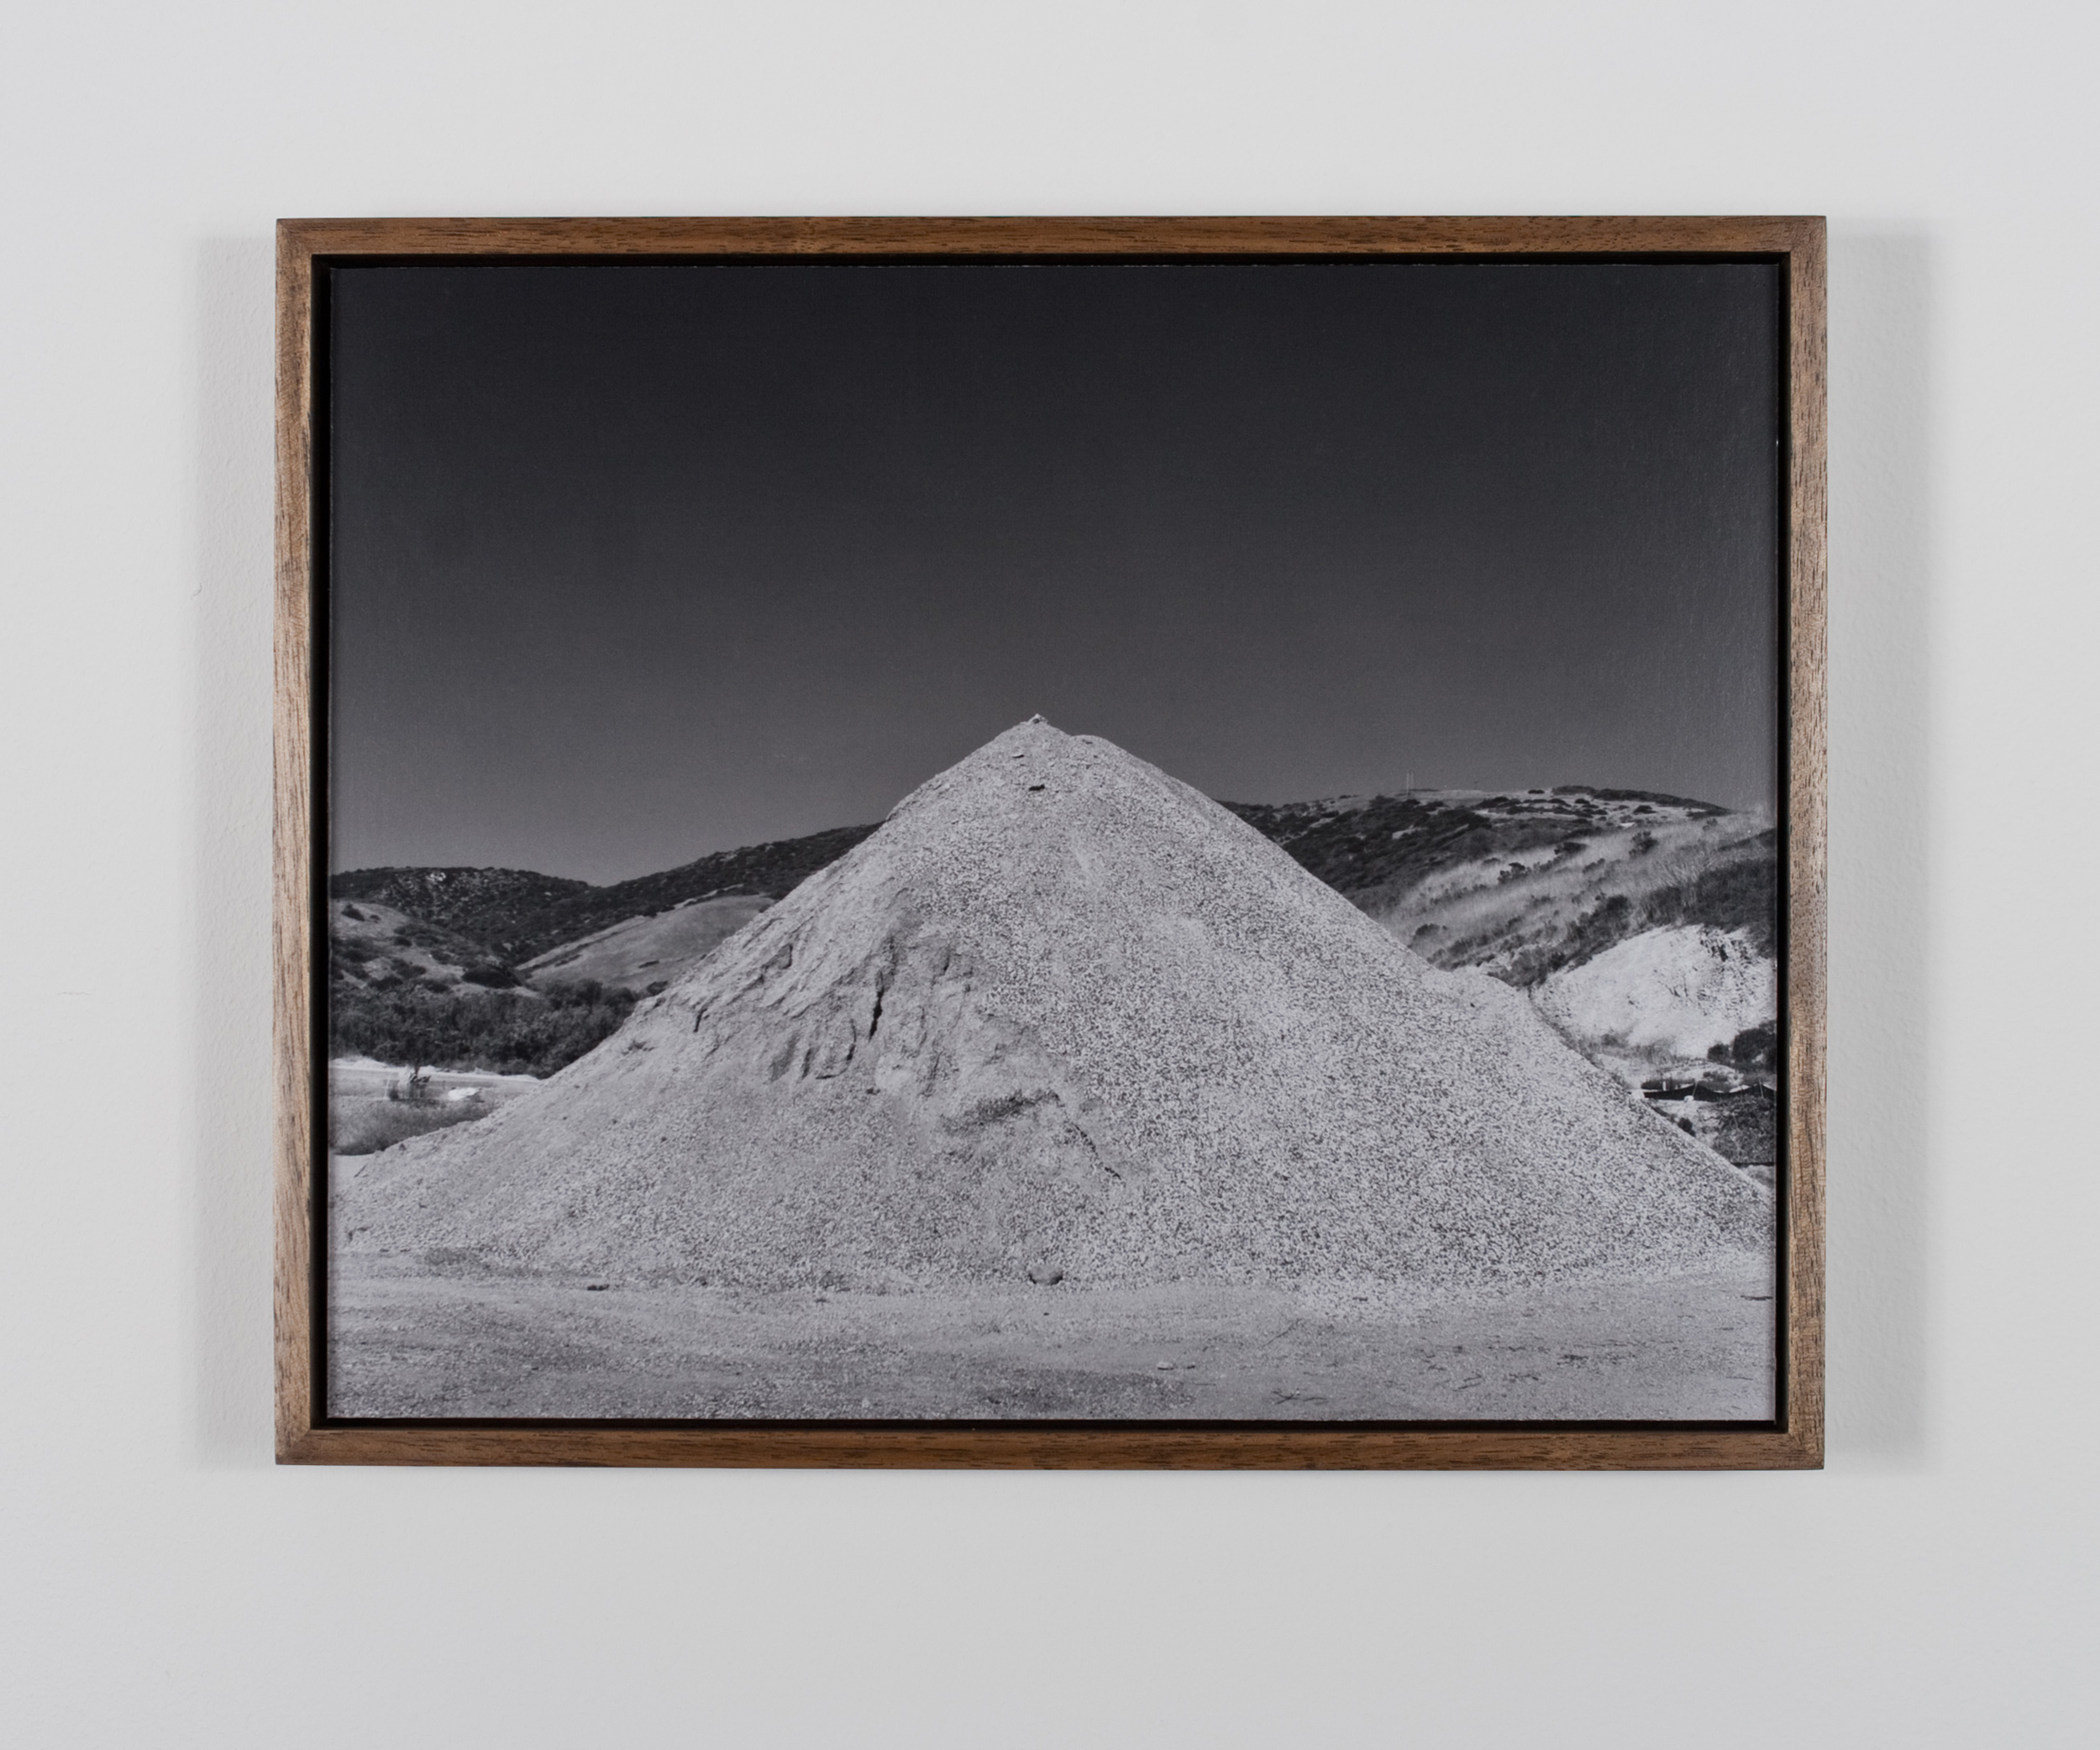 Pico de Arco (aka Arco Lagona) 2009/10 Gelatin-silver print on Dibond, with walnut frame